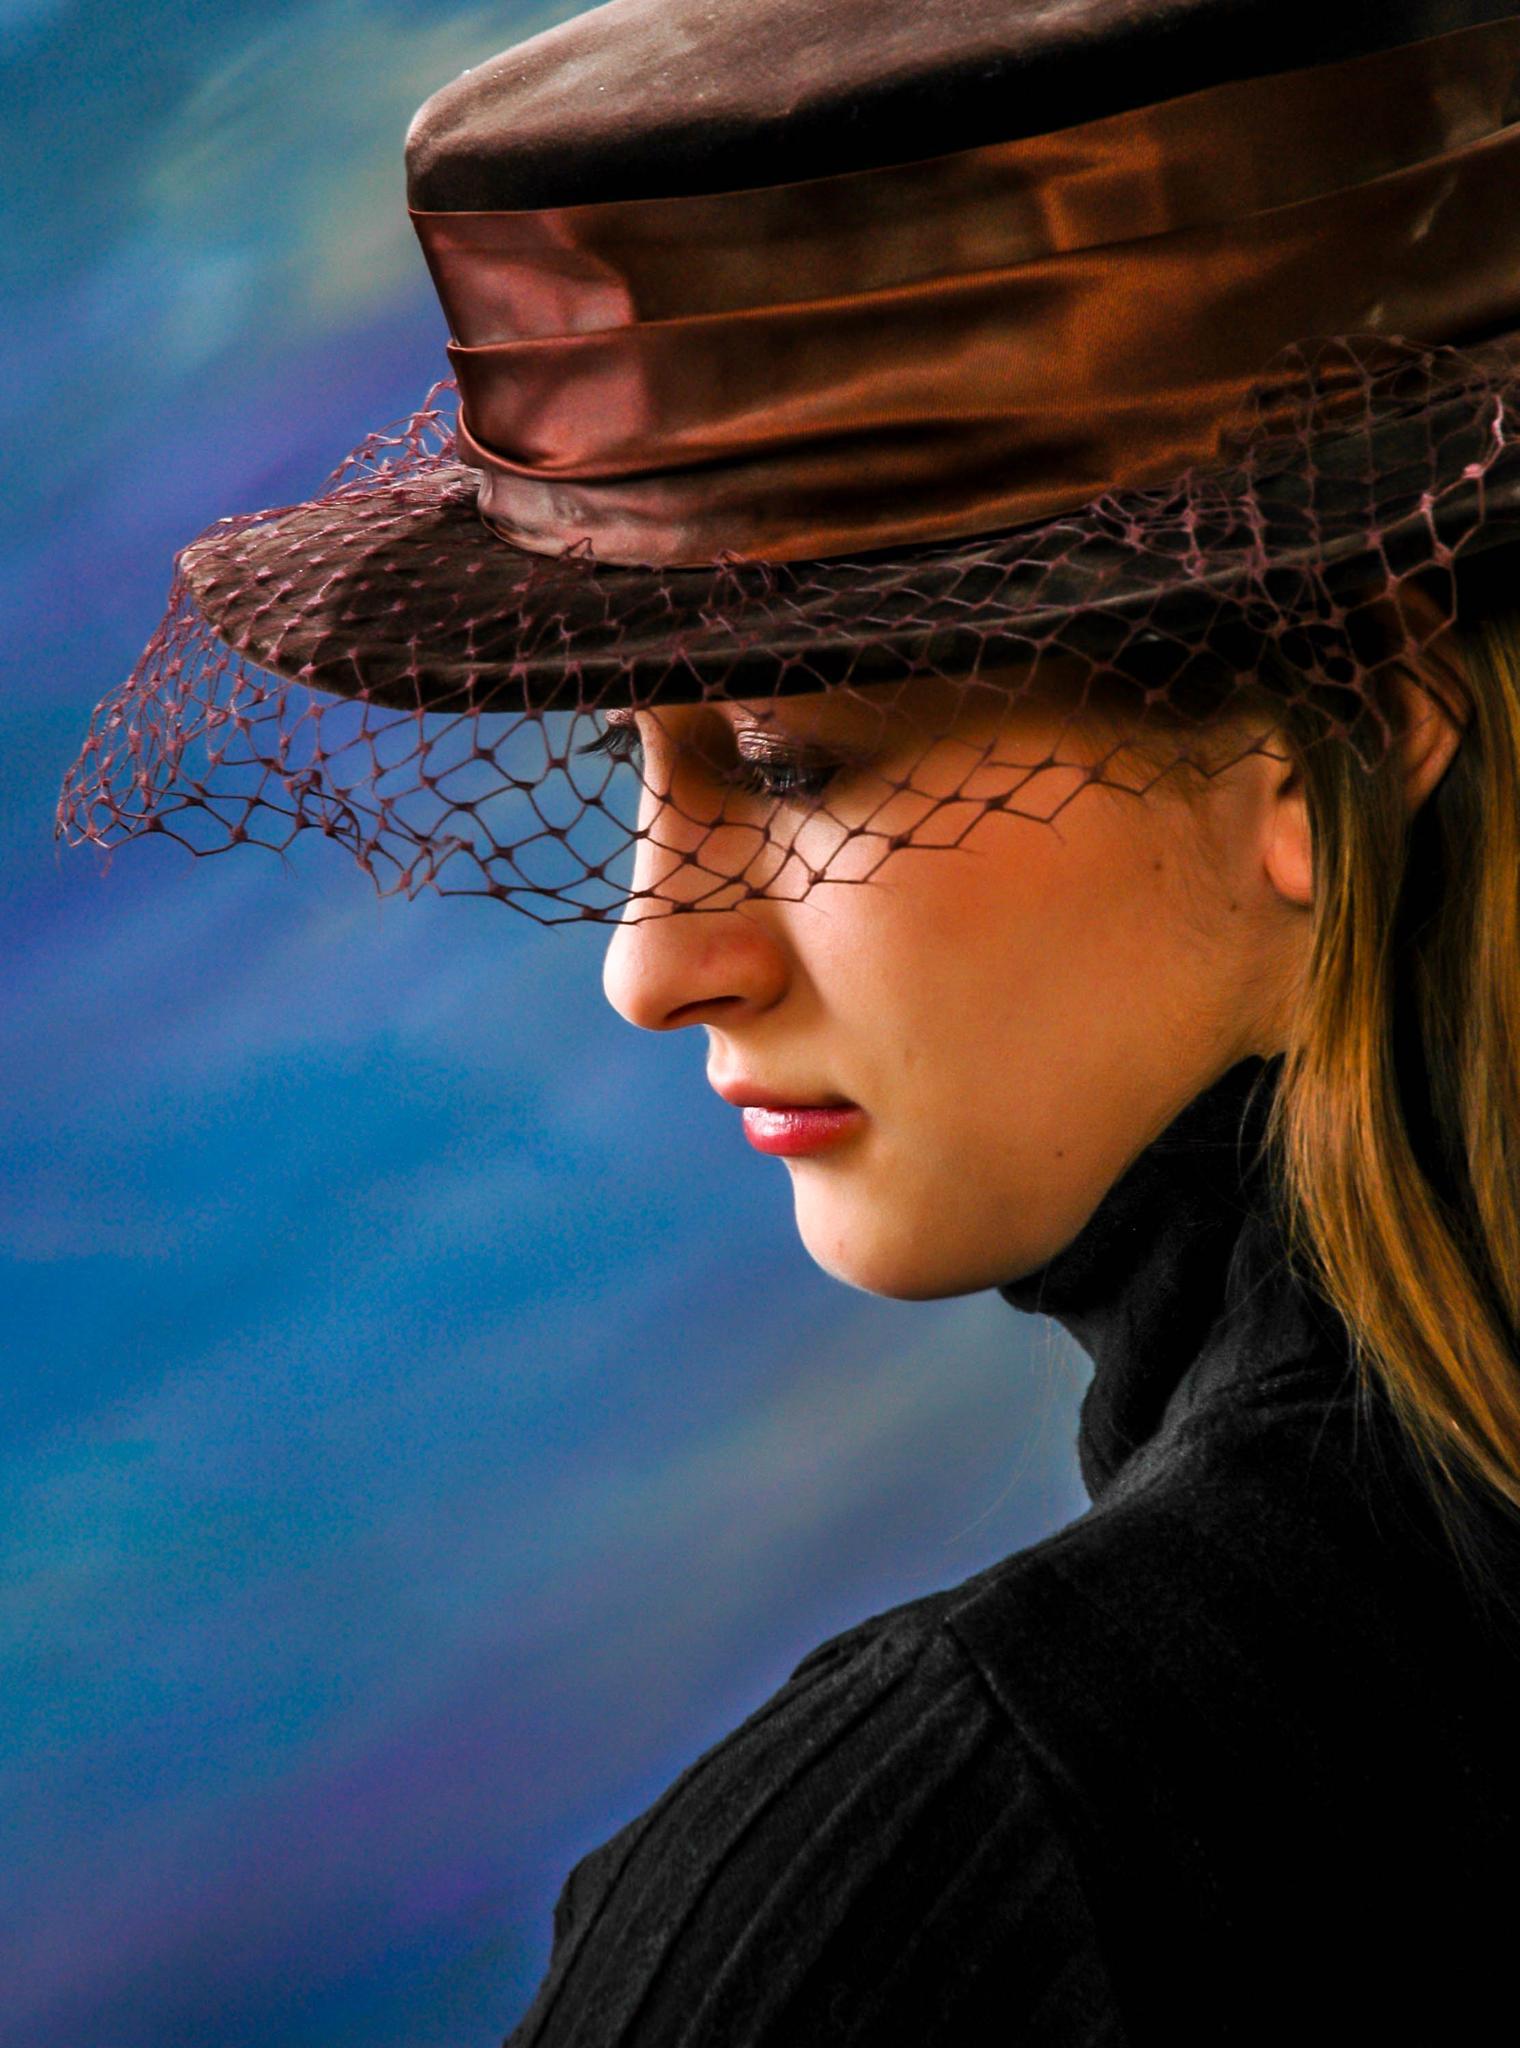 Ashley Hat by wes.johnson.58